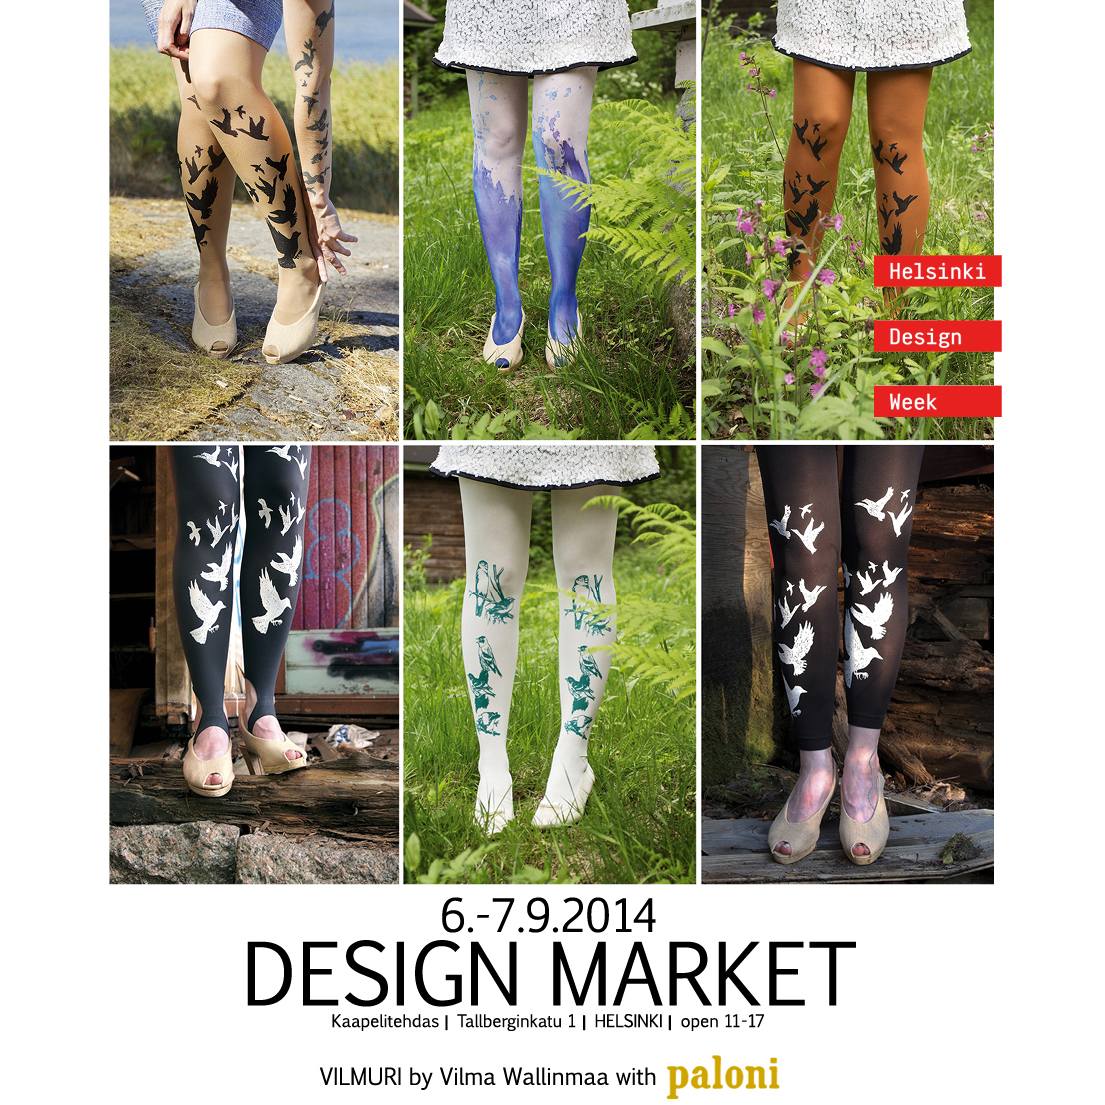 design market 2014